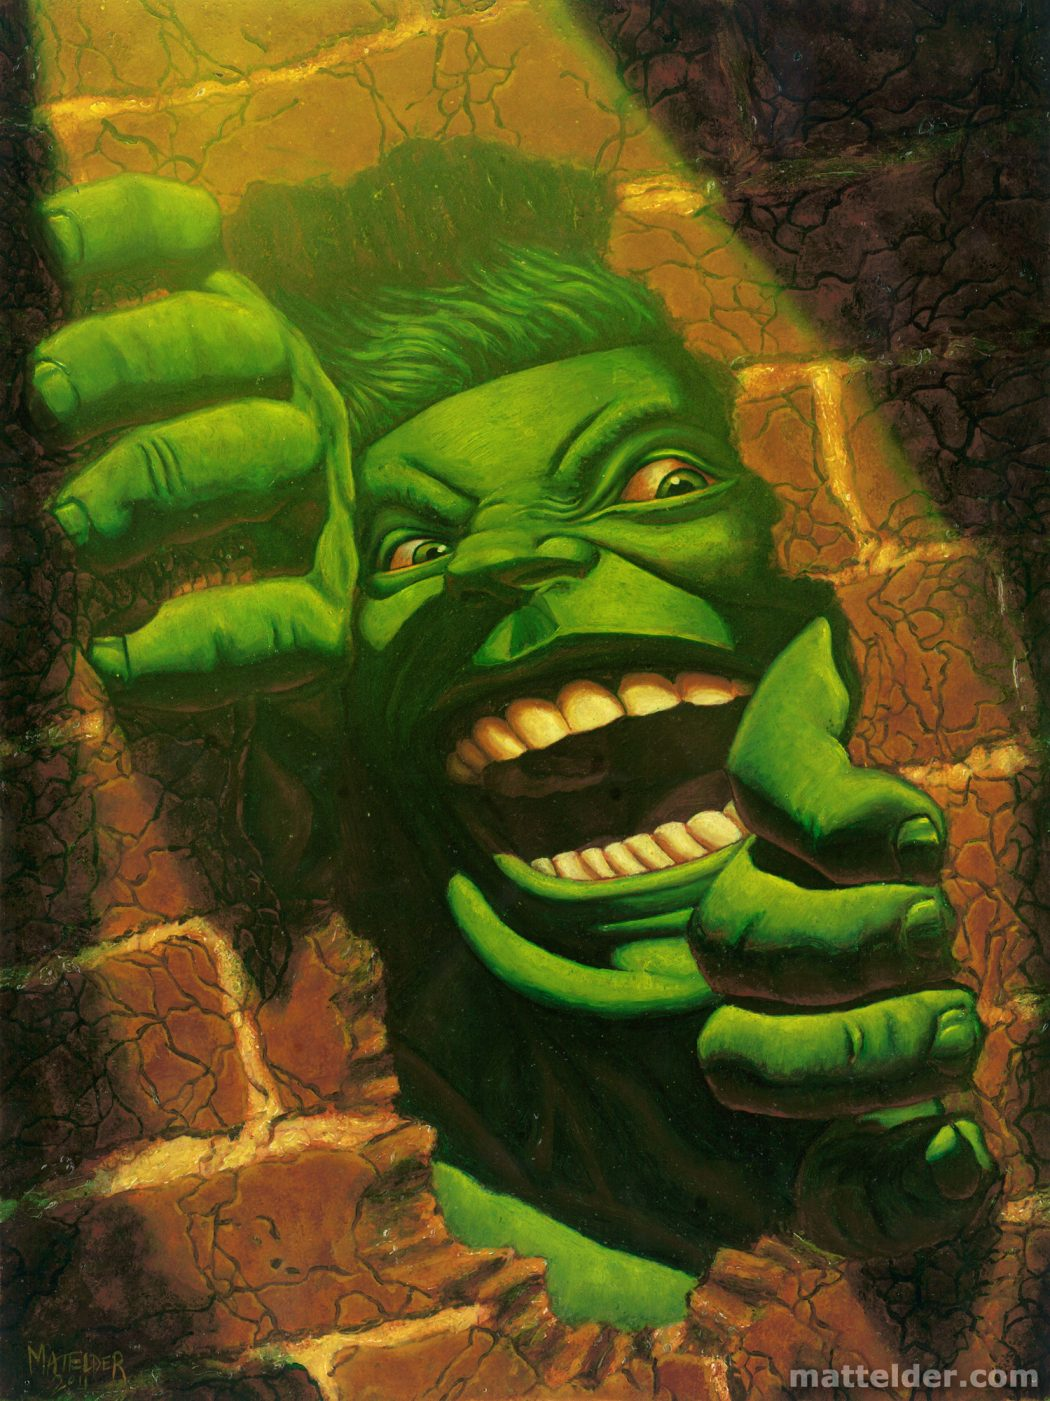 hulk_smash_brick_wall___oil_painting_by_mattelder- 25 Strangest Wall Paintings